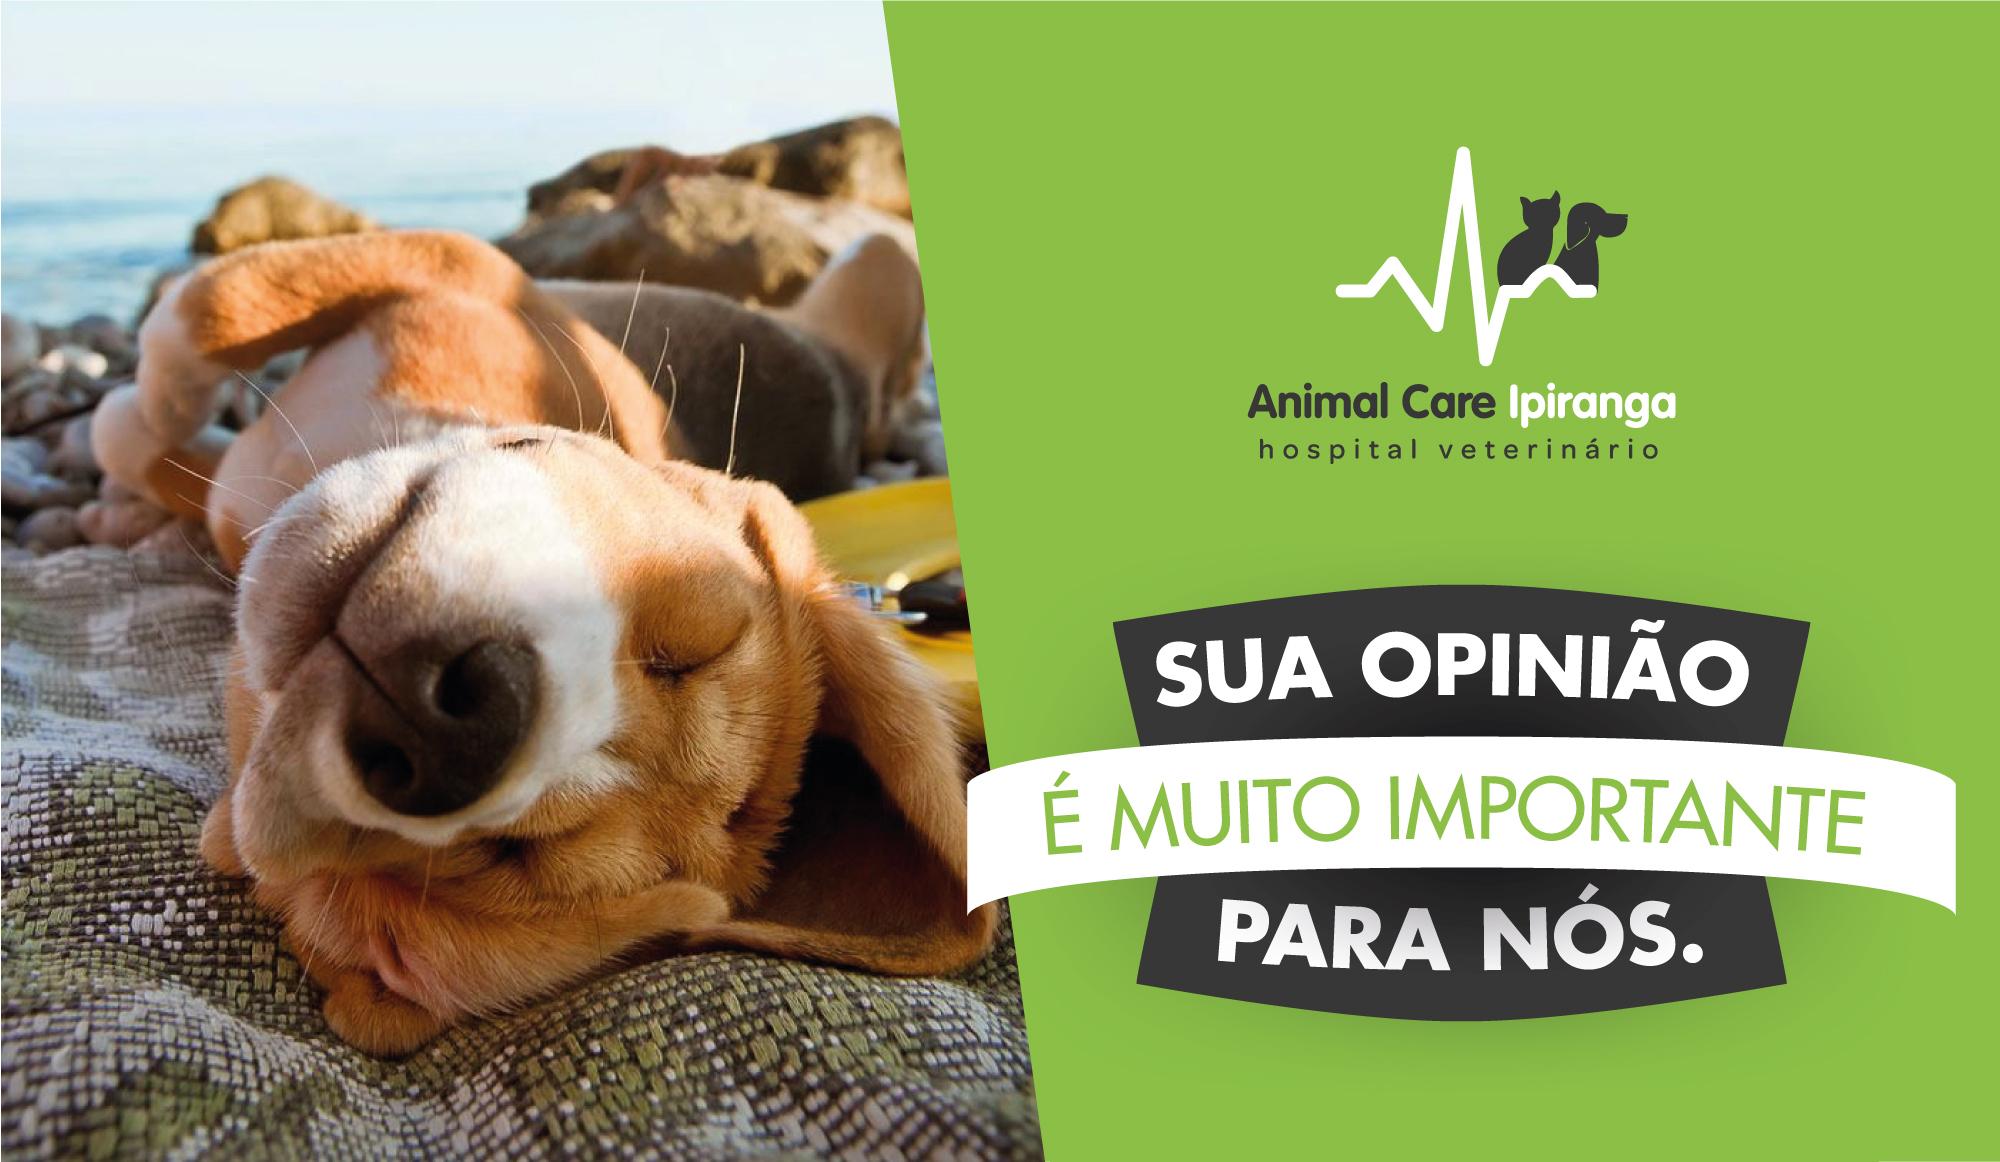 site_pesquisa_de_mercado_animal_care_ipiranga_ly01.jpg